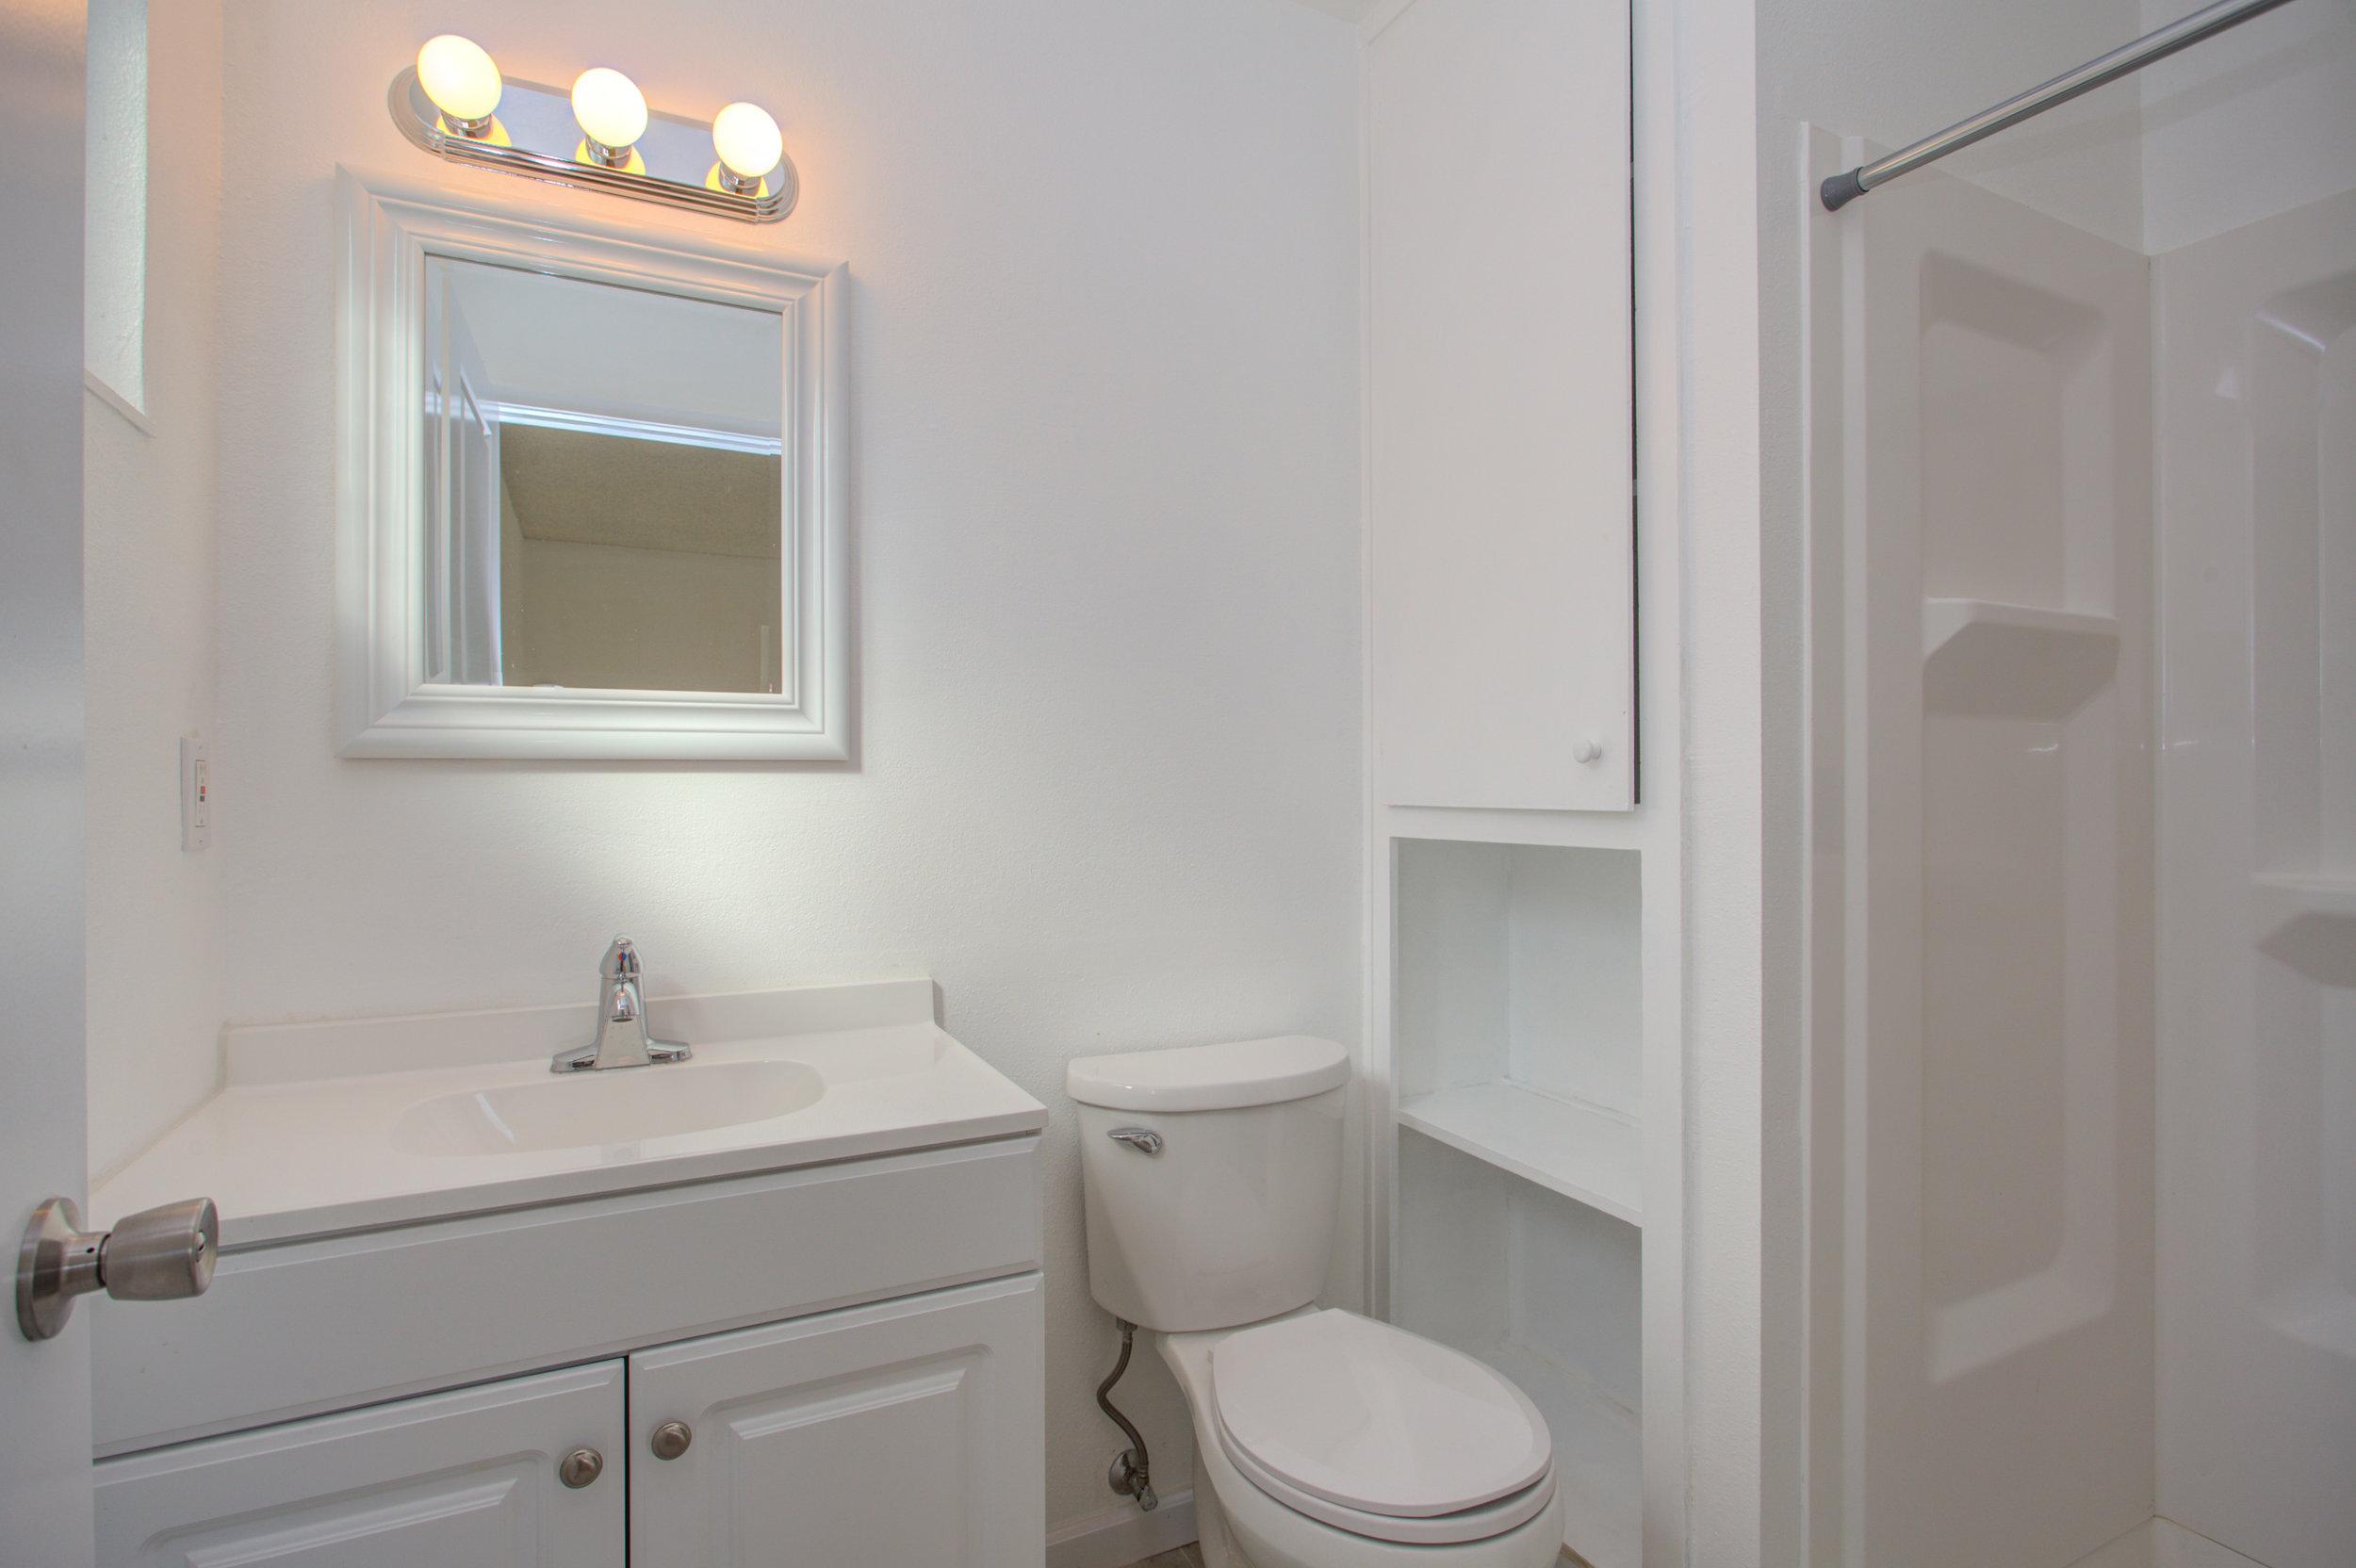 1961_mclaughlin_ave_MLS_HID1162795_ROOMmasterbathroom.jpg